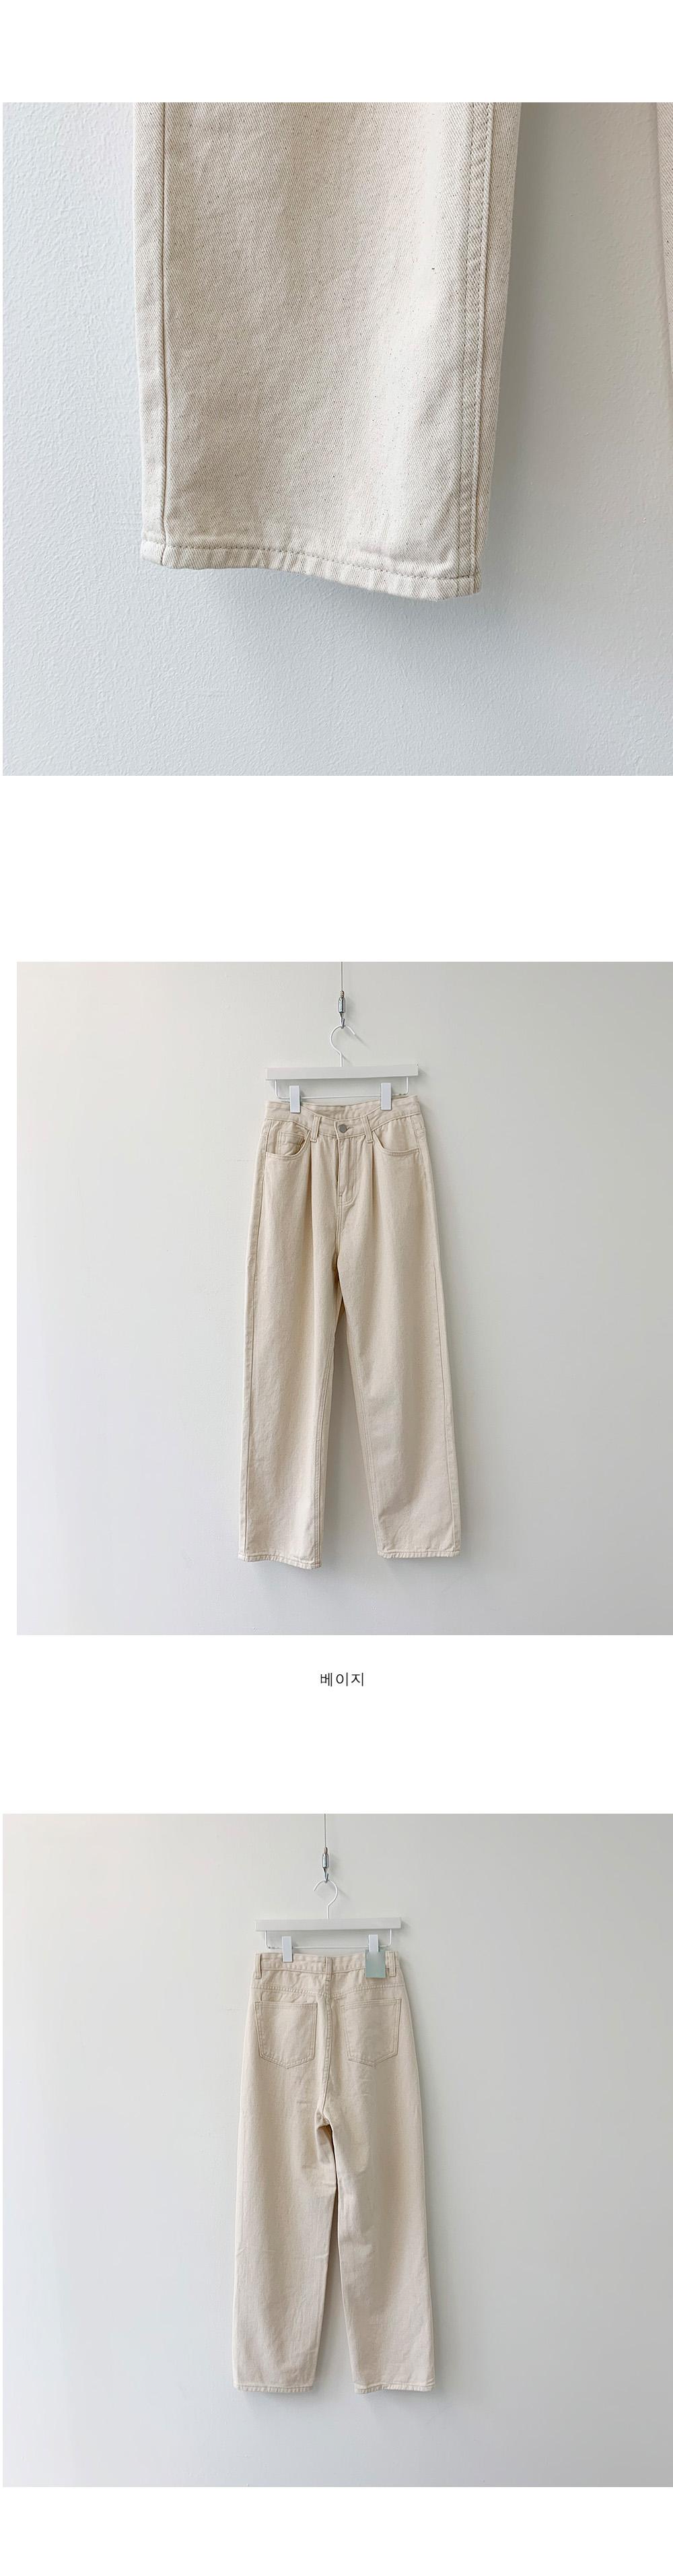 Oatmeal Beige Pintuck Wide Pants